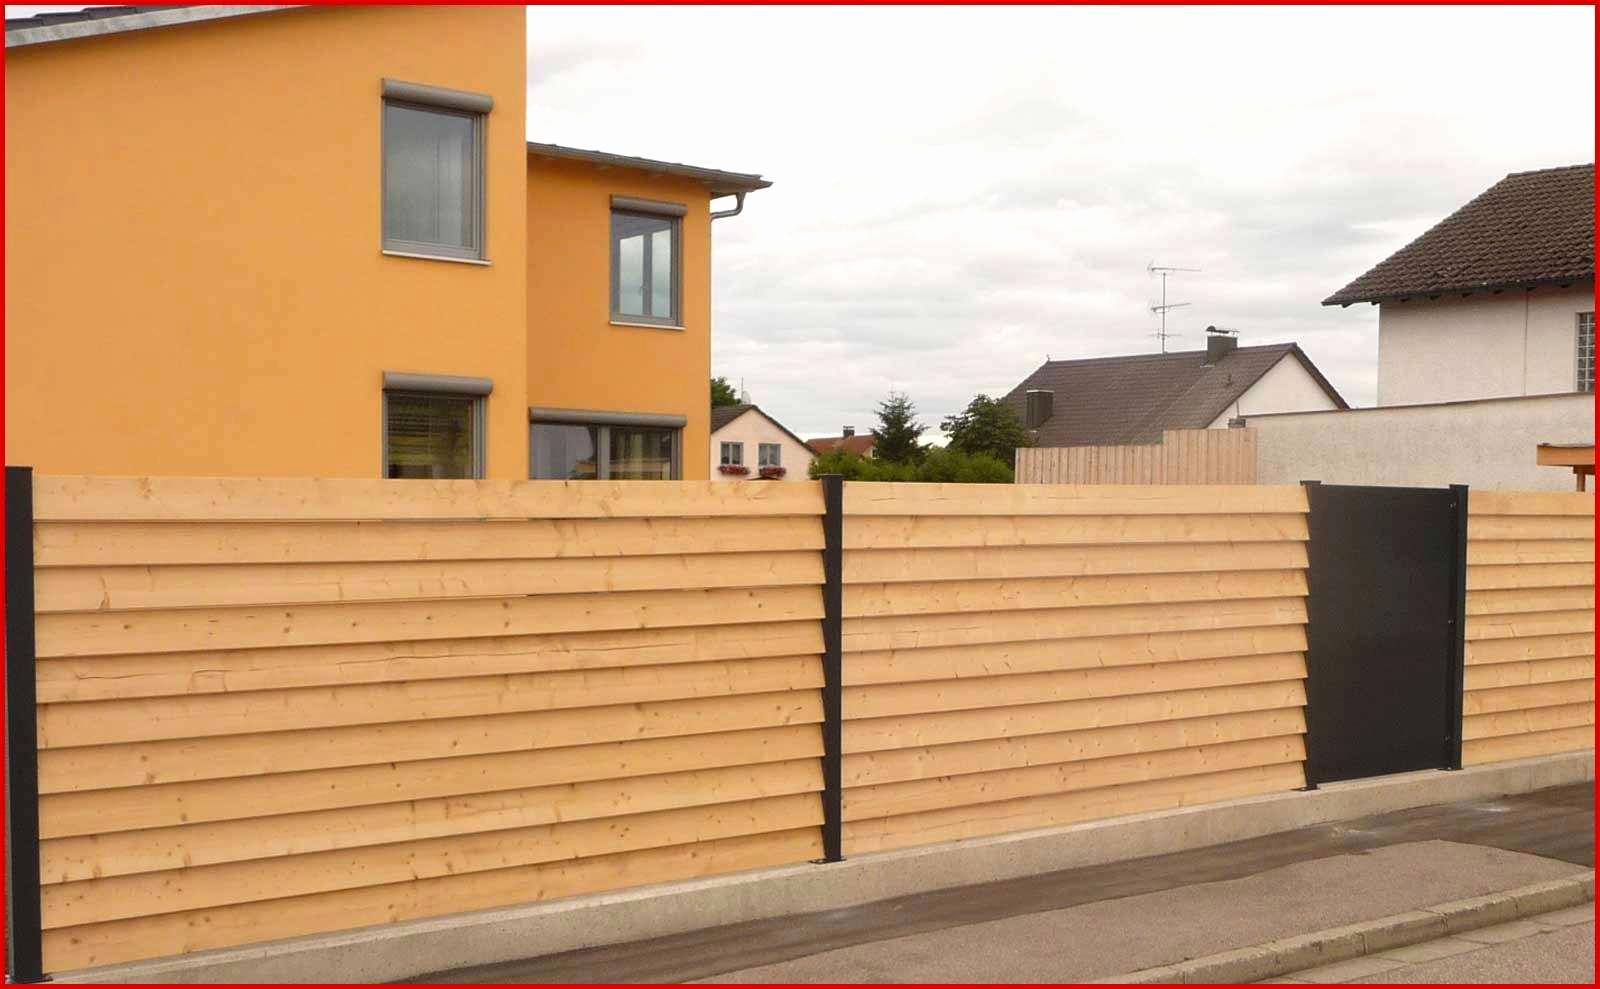 terrasse anlegen ideen schon gartenzaun selber bauen ideen inspirierend wpc zaun selber bauen of terrasse anlegen ideen